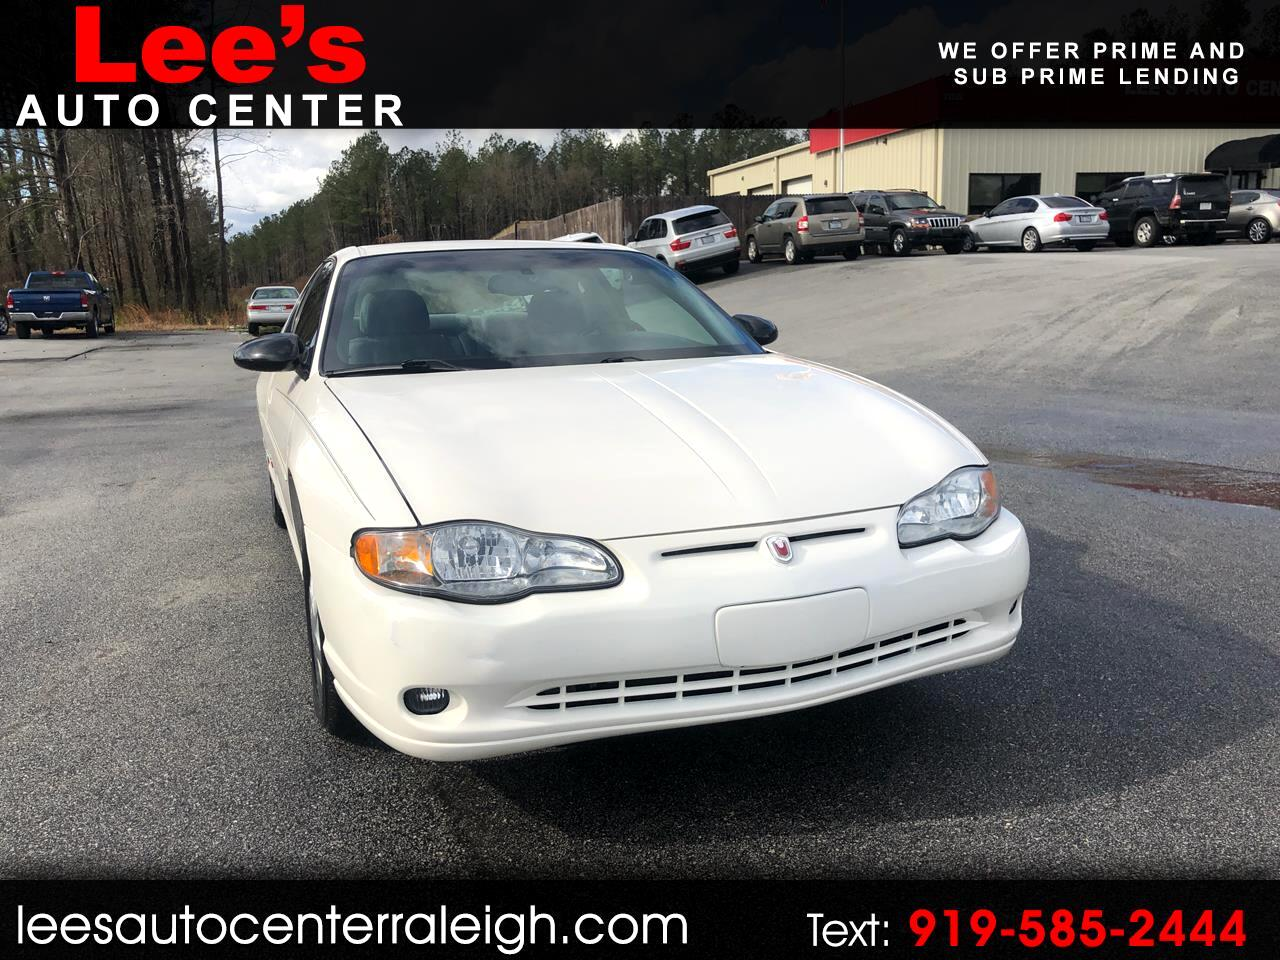 2001 Chevrolet Monte Carlo 2dr Cpe SS